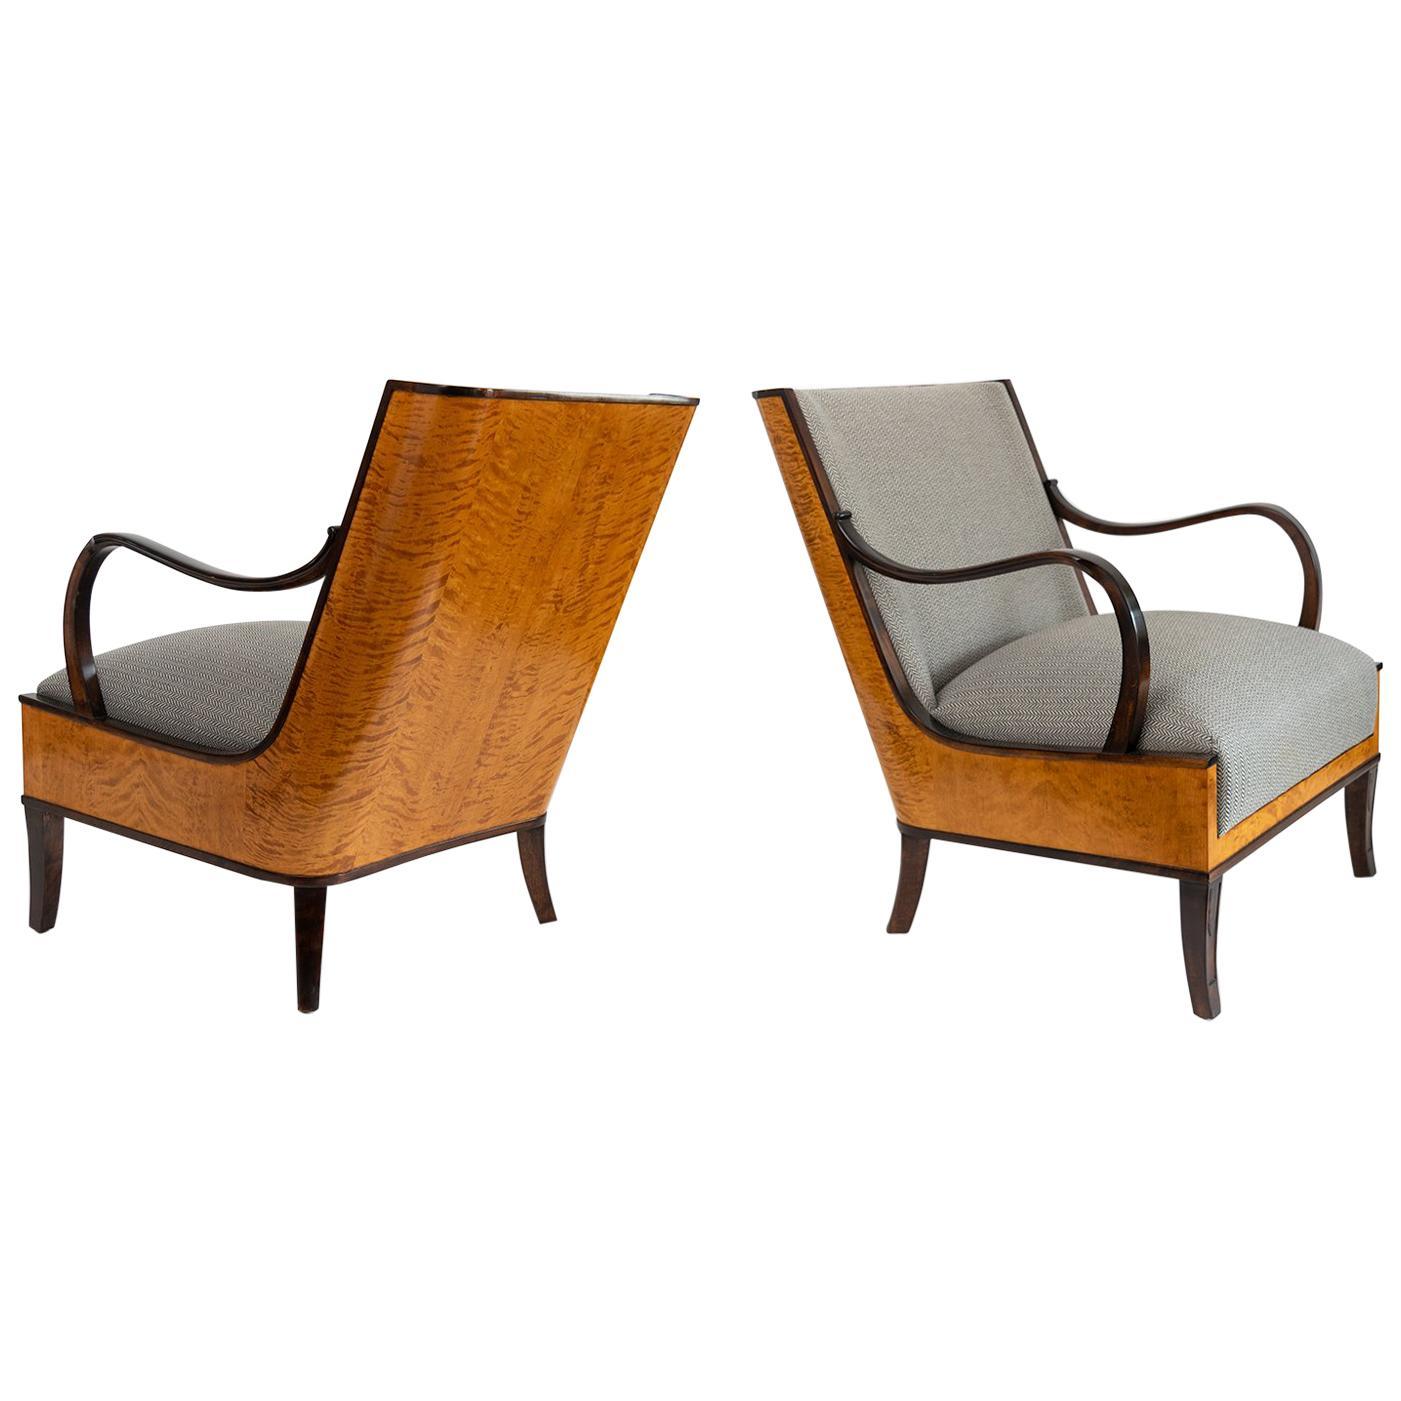 Erik Chambert Swedish Art Deco Pair of Lounge Chairs with Flame Birch Veneer